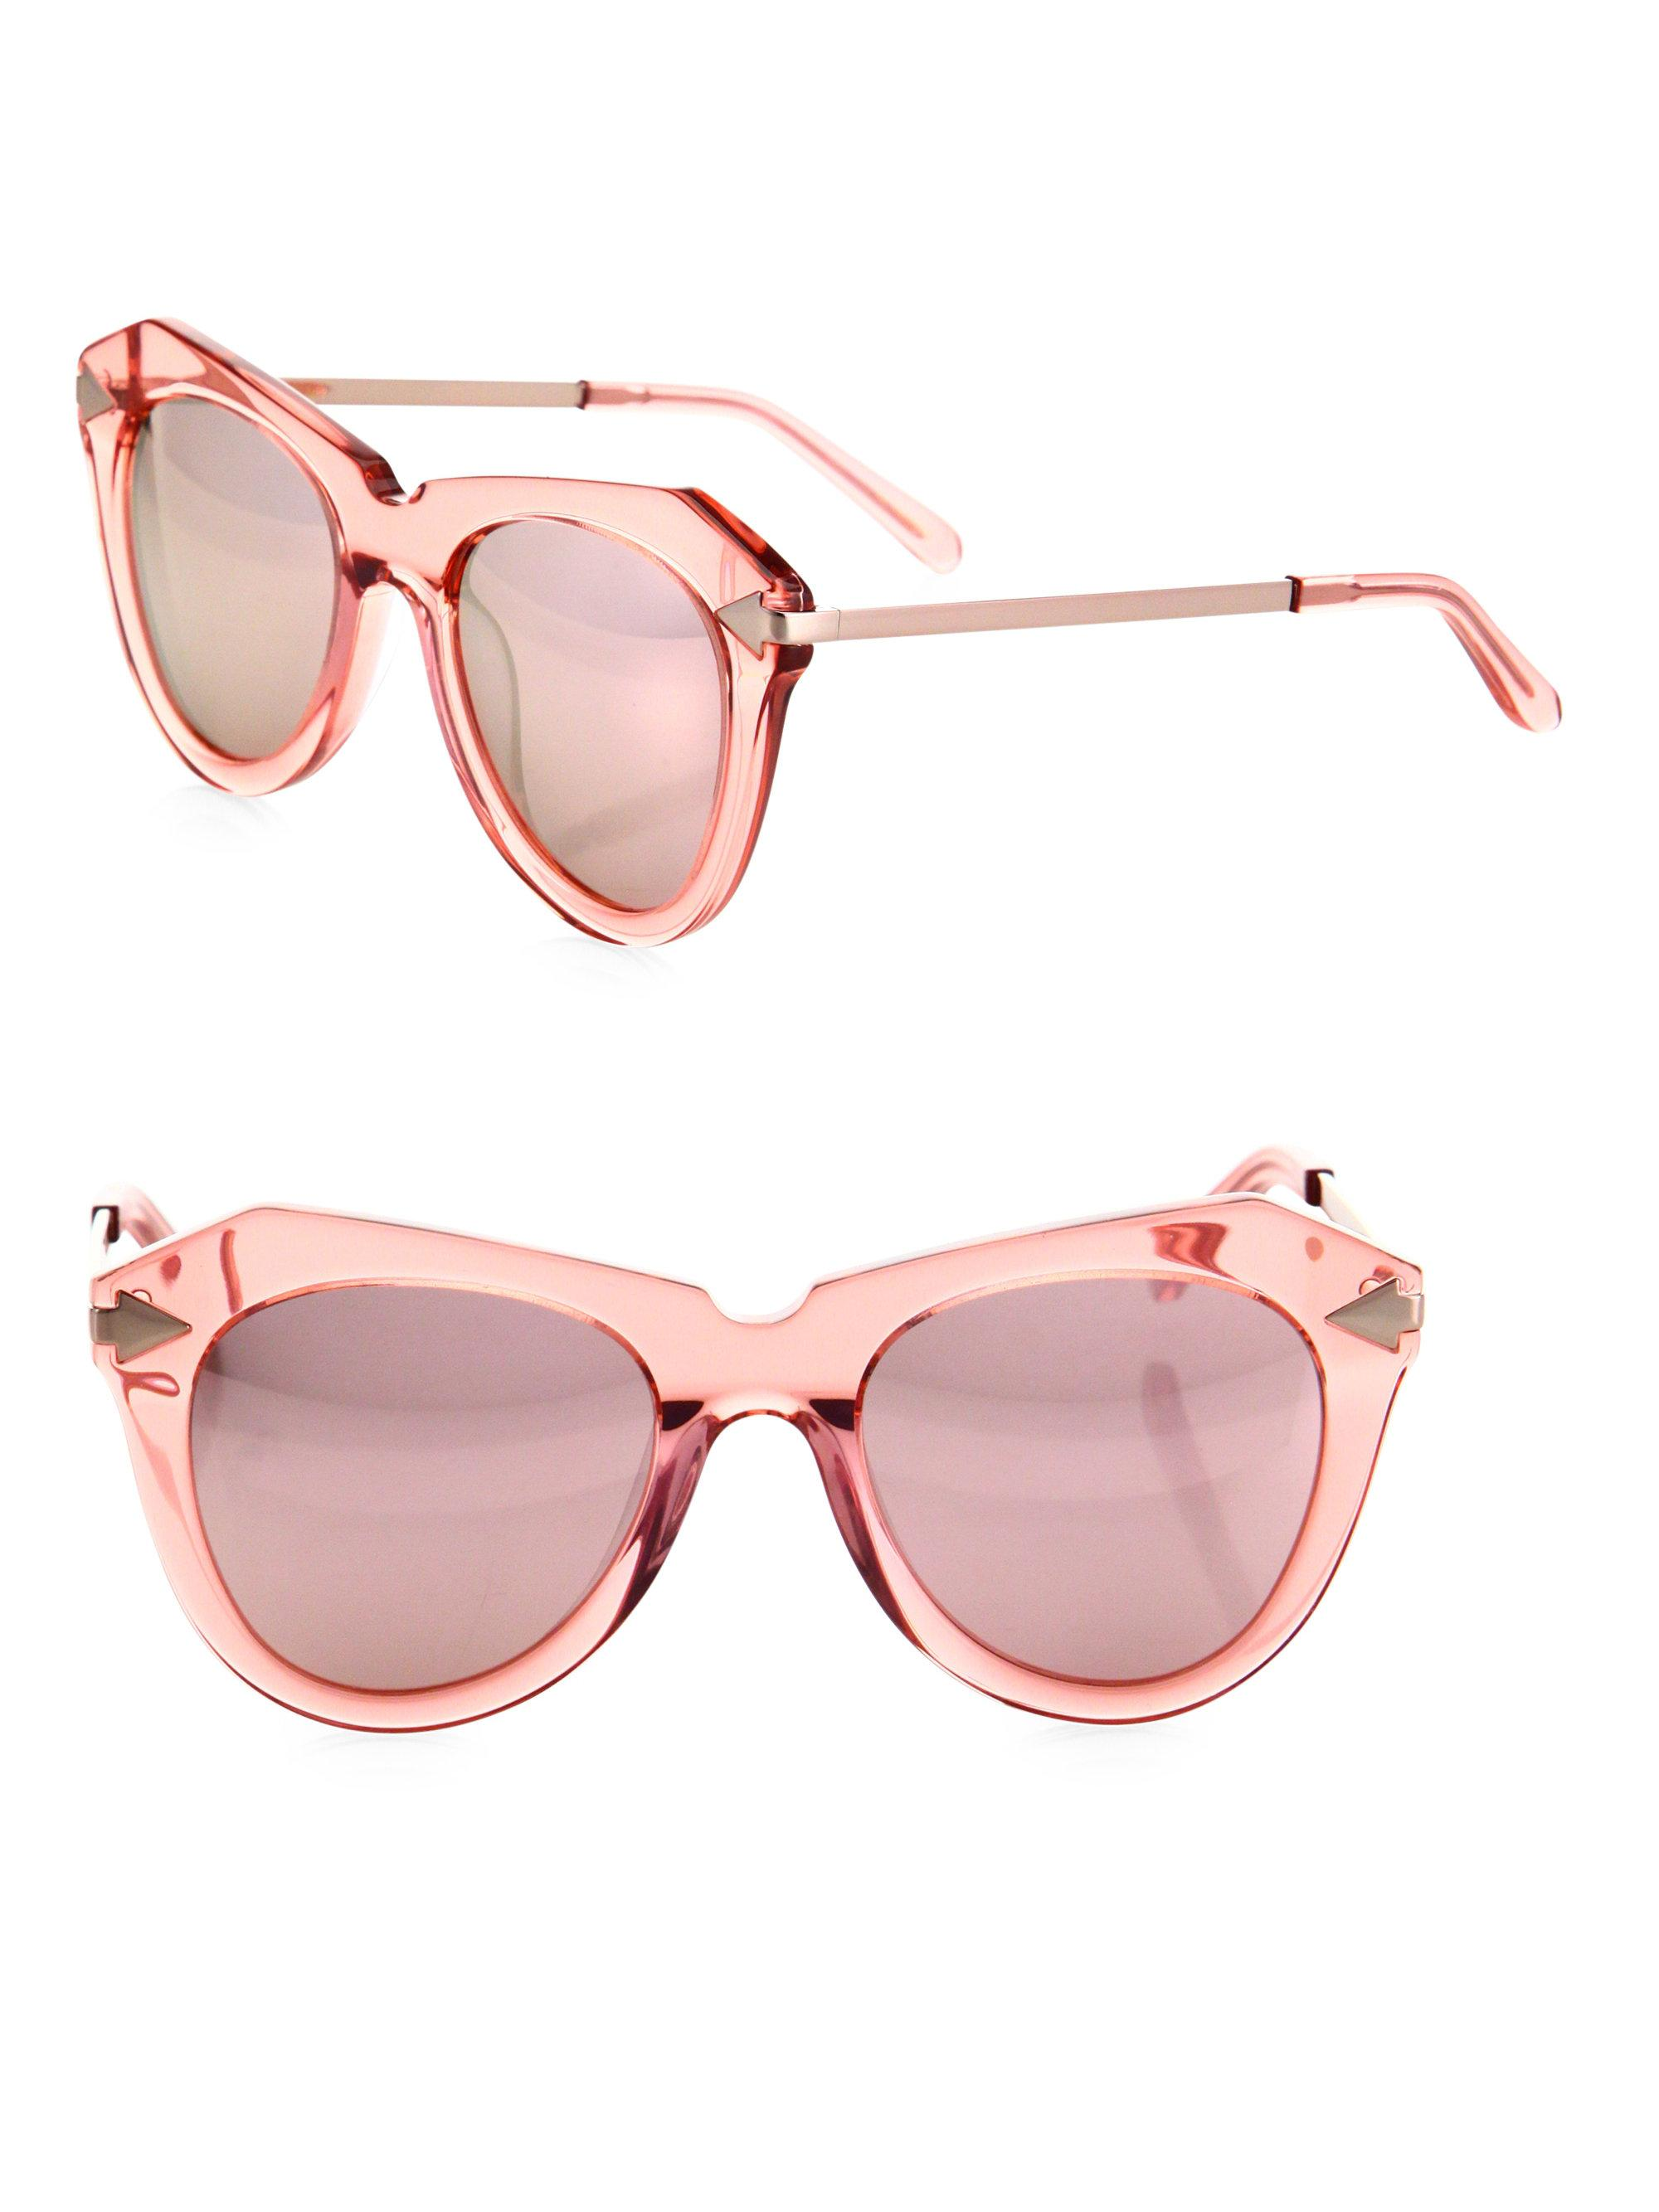 22c9e6930ea Karen Walker One Star 51mm Mirrored Cat Eye Sunglasses in Pink - Lyst